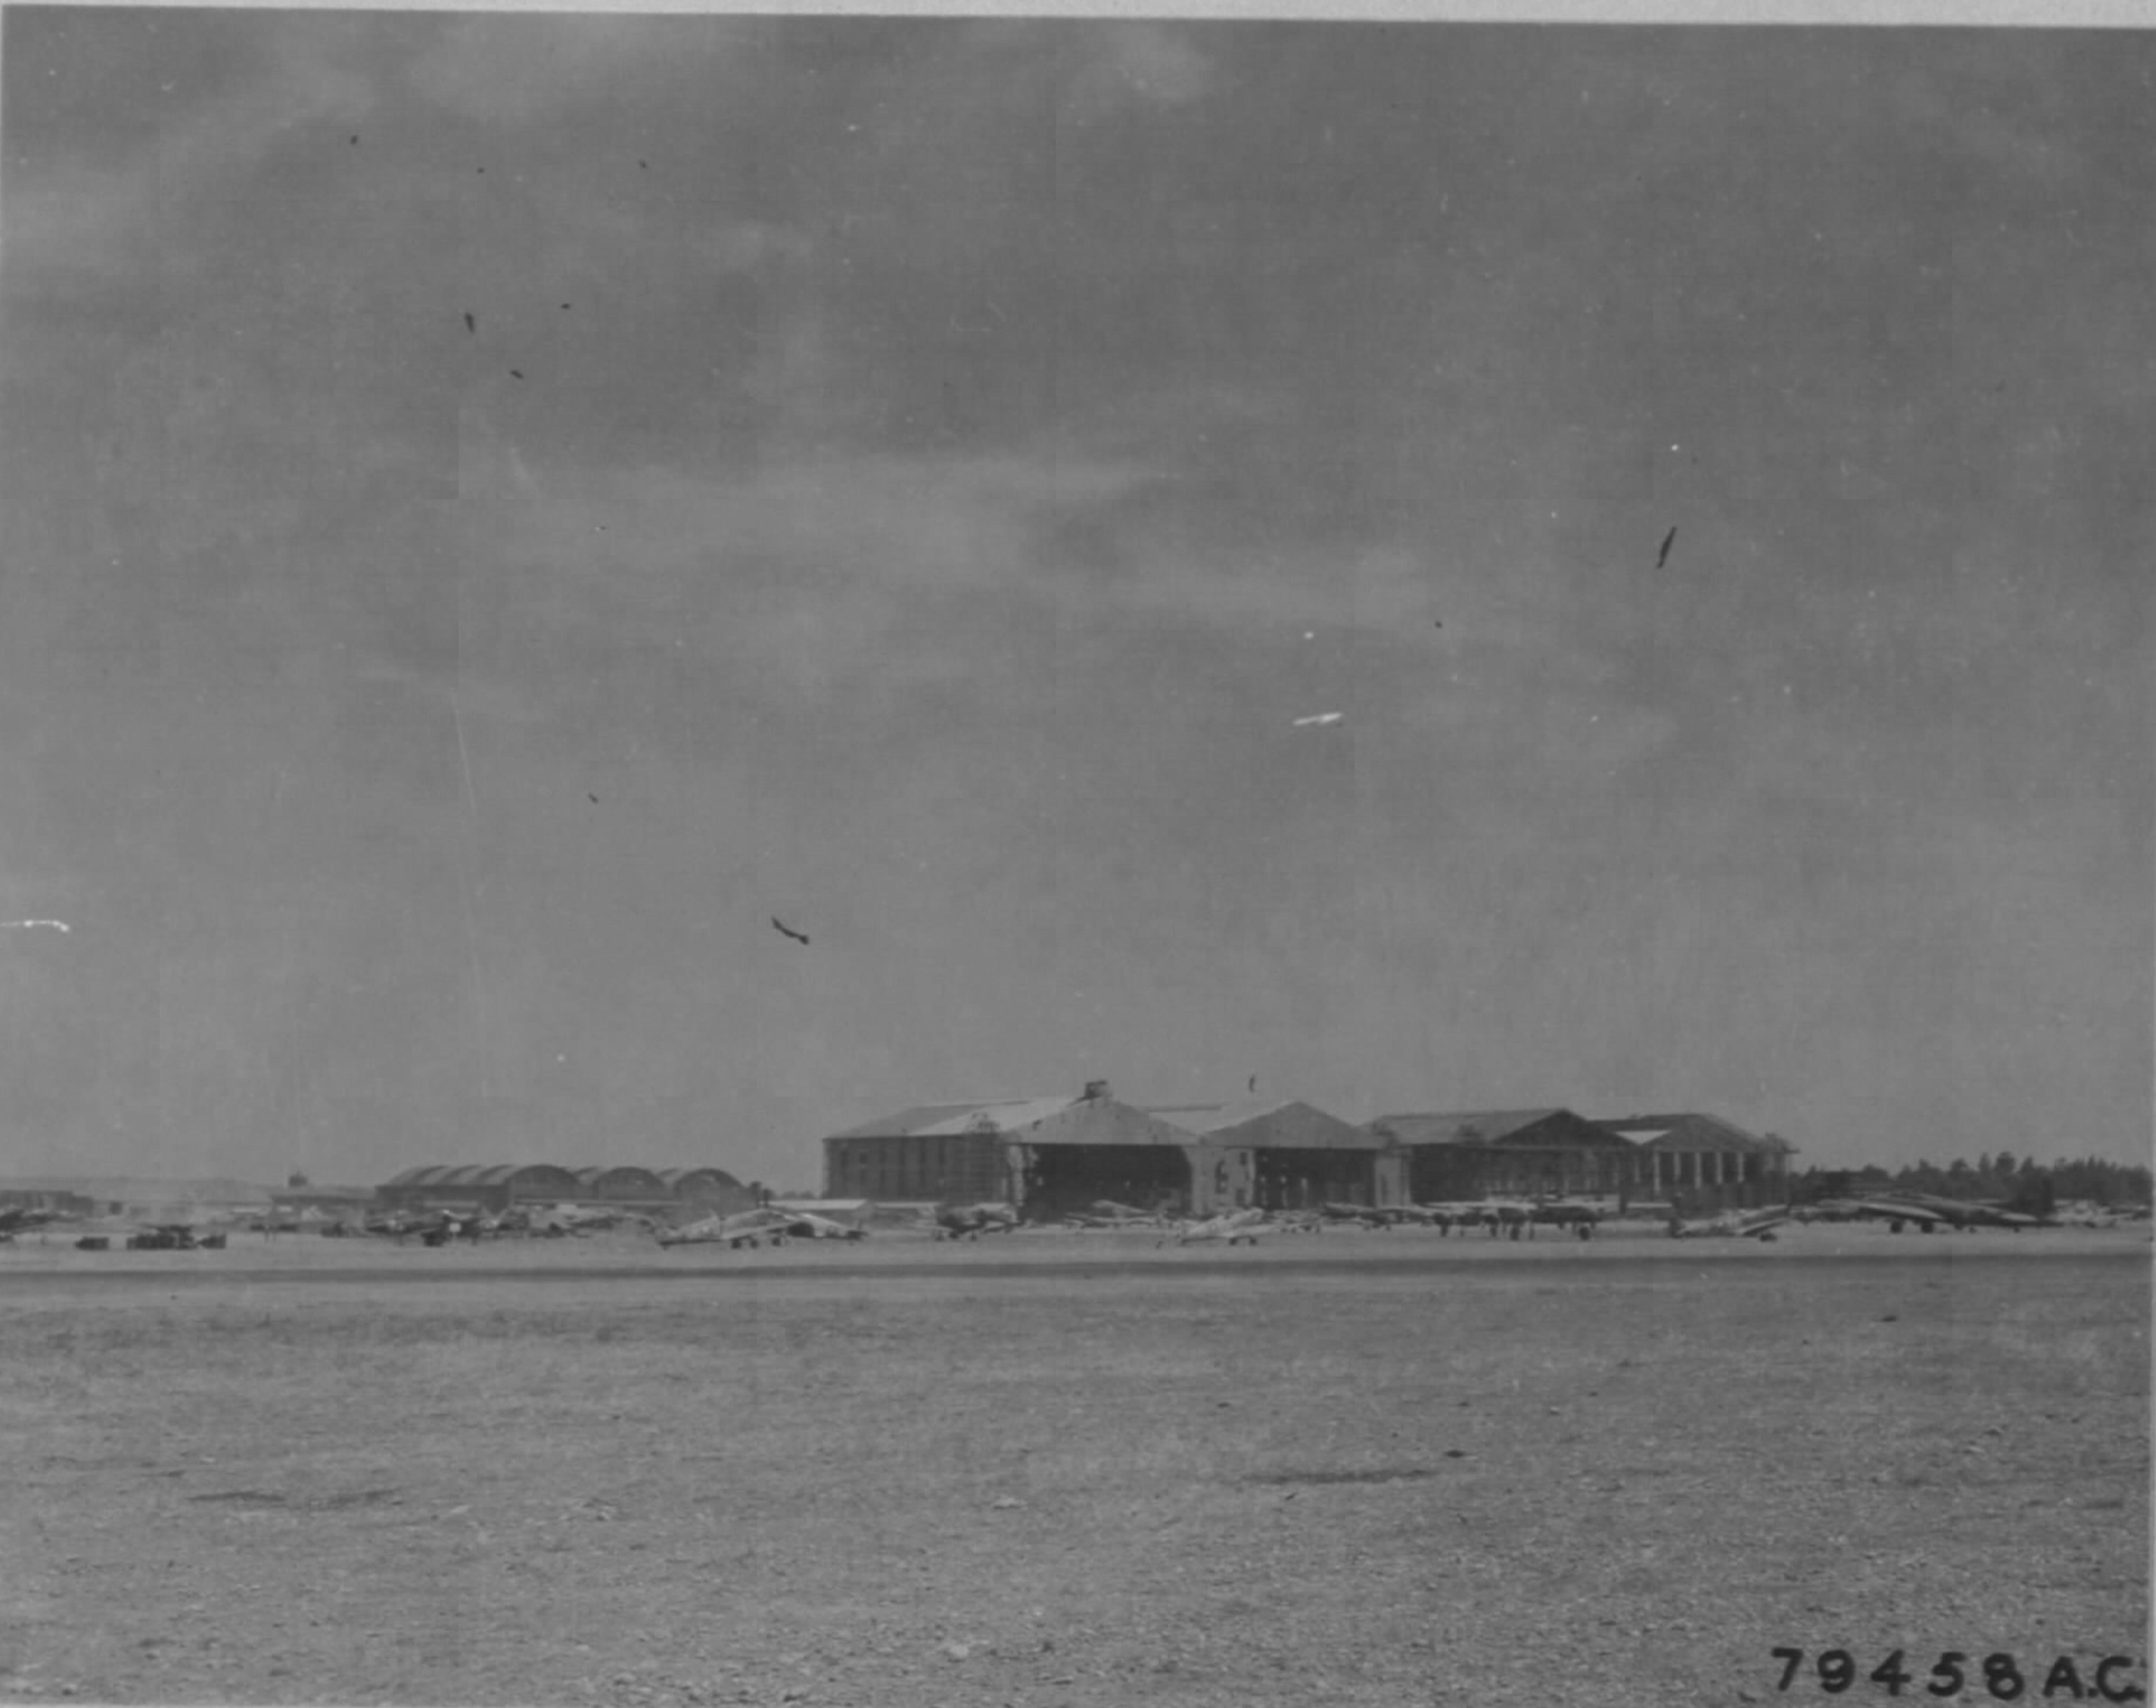 Airbase hangars at Maison Blanche Airfield Algiers Algeria June 1943 01